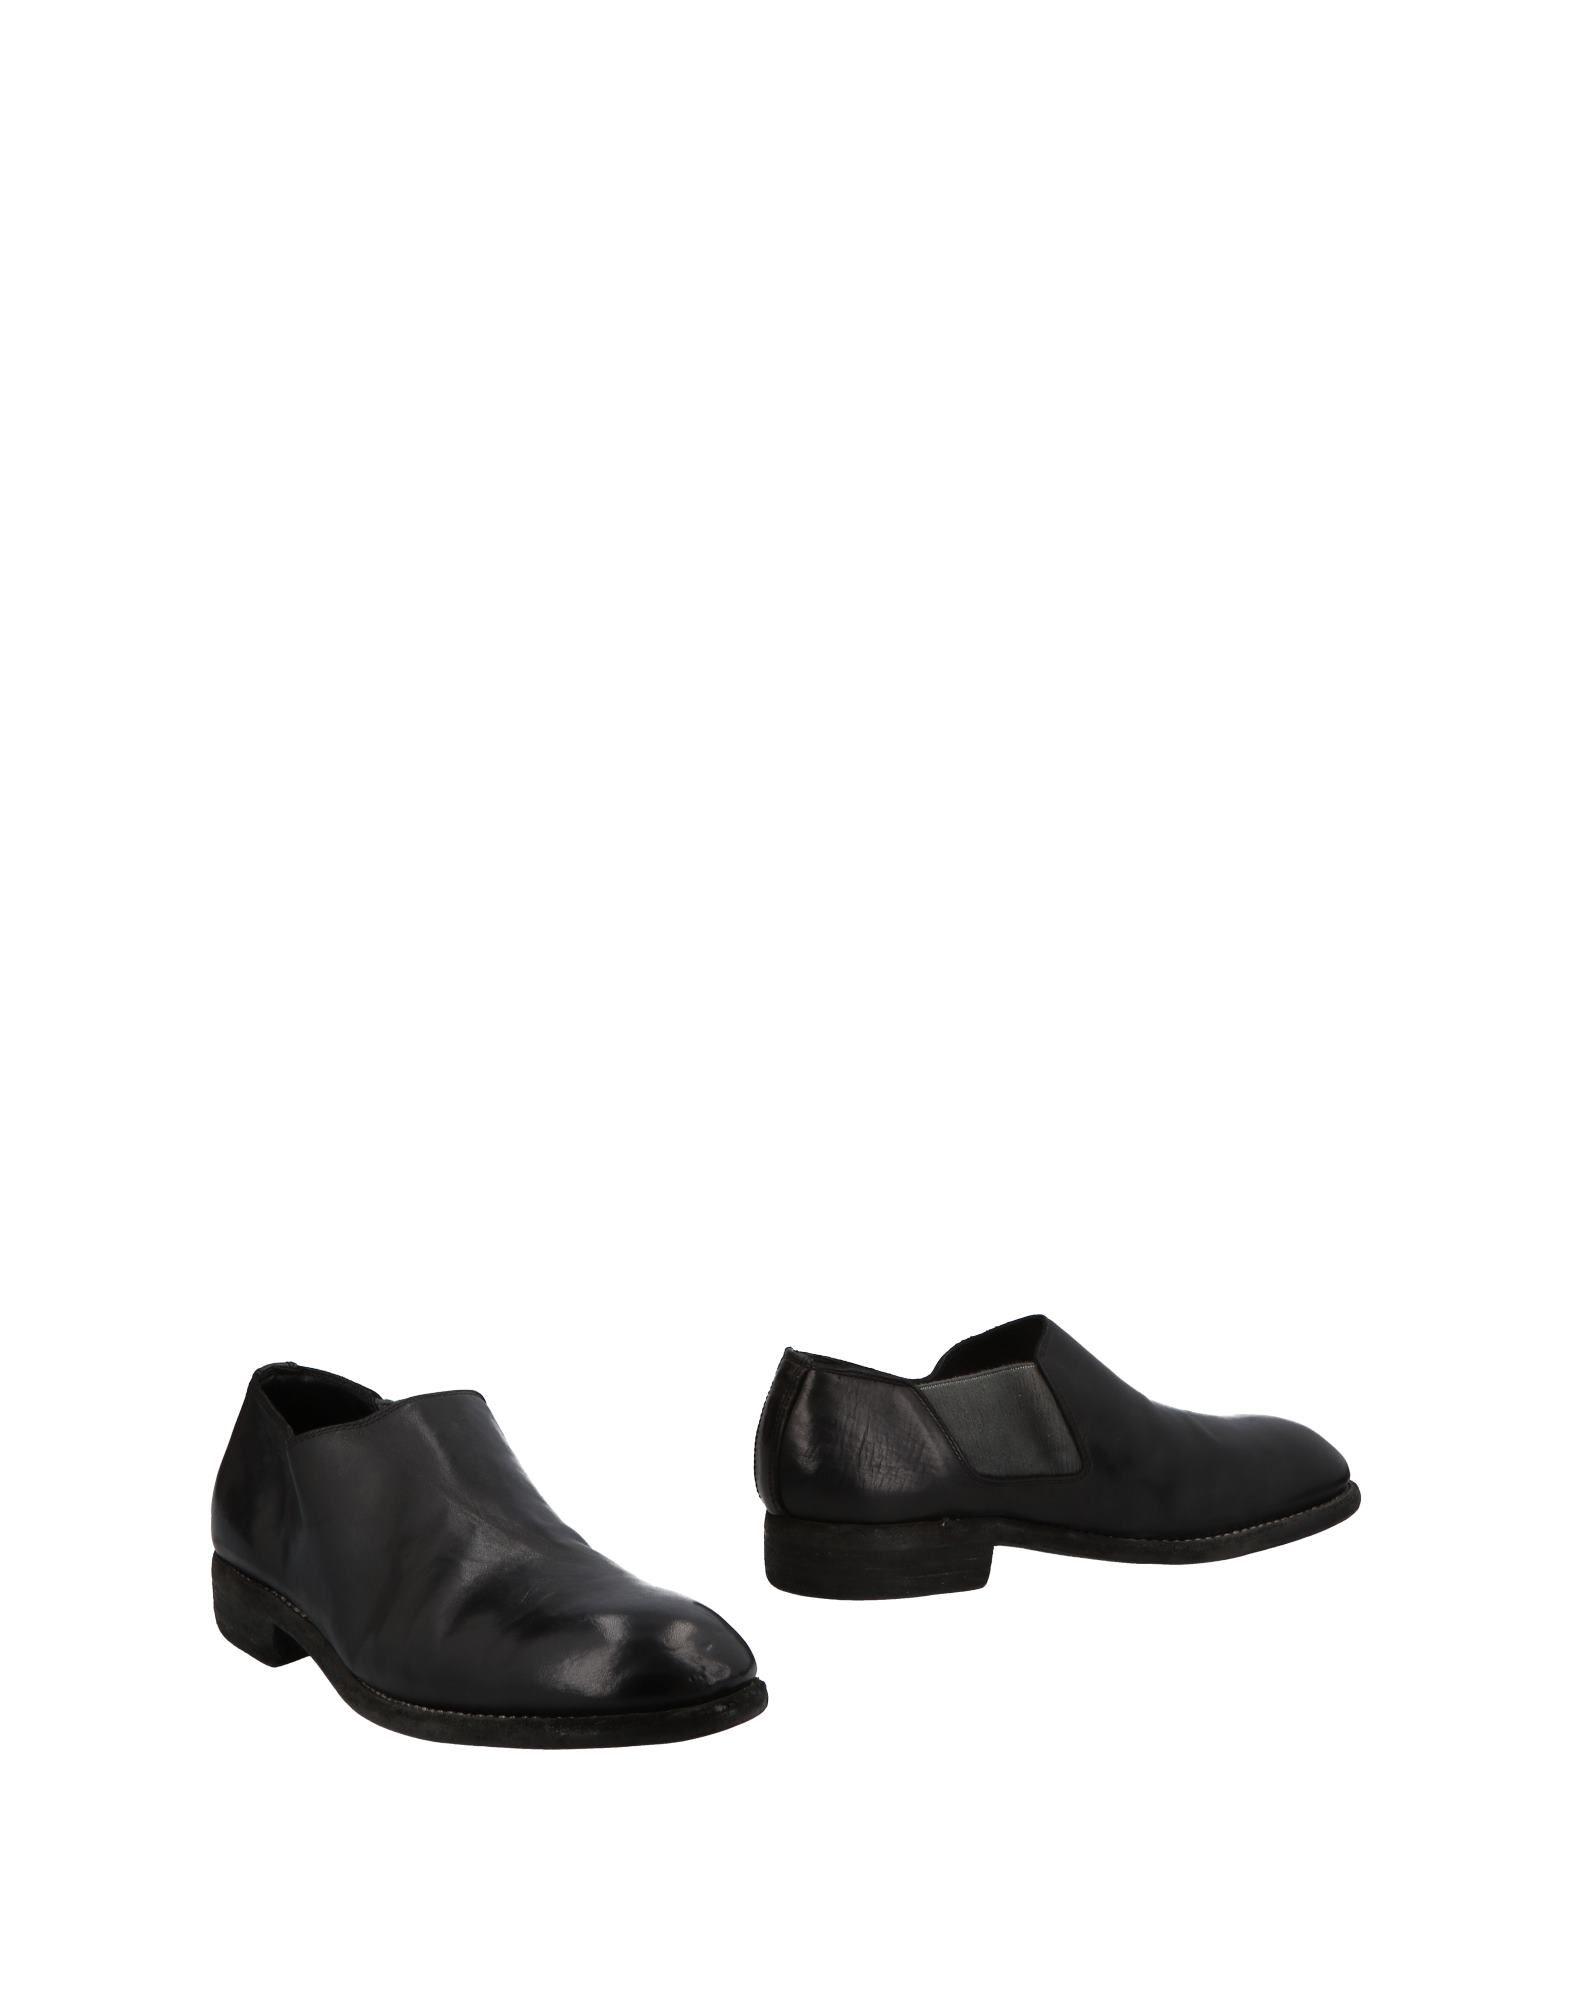 Guidi Mokassins Herren  11489090SJ Gute Qualität beliebte Schuhe